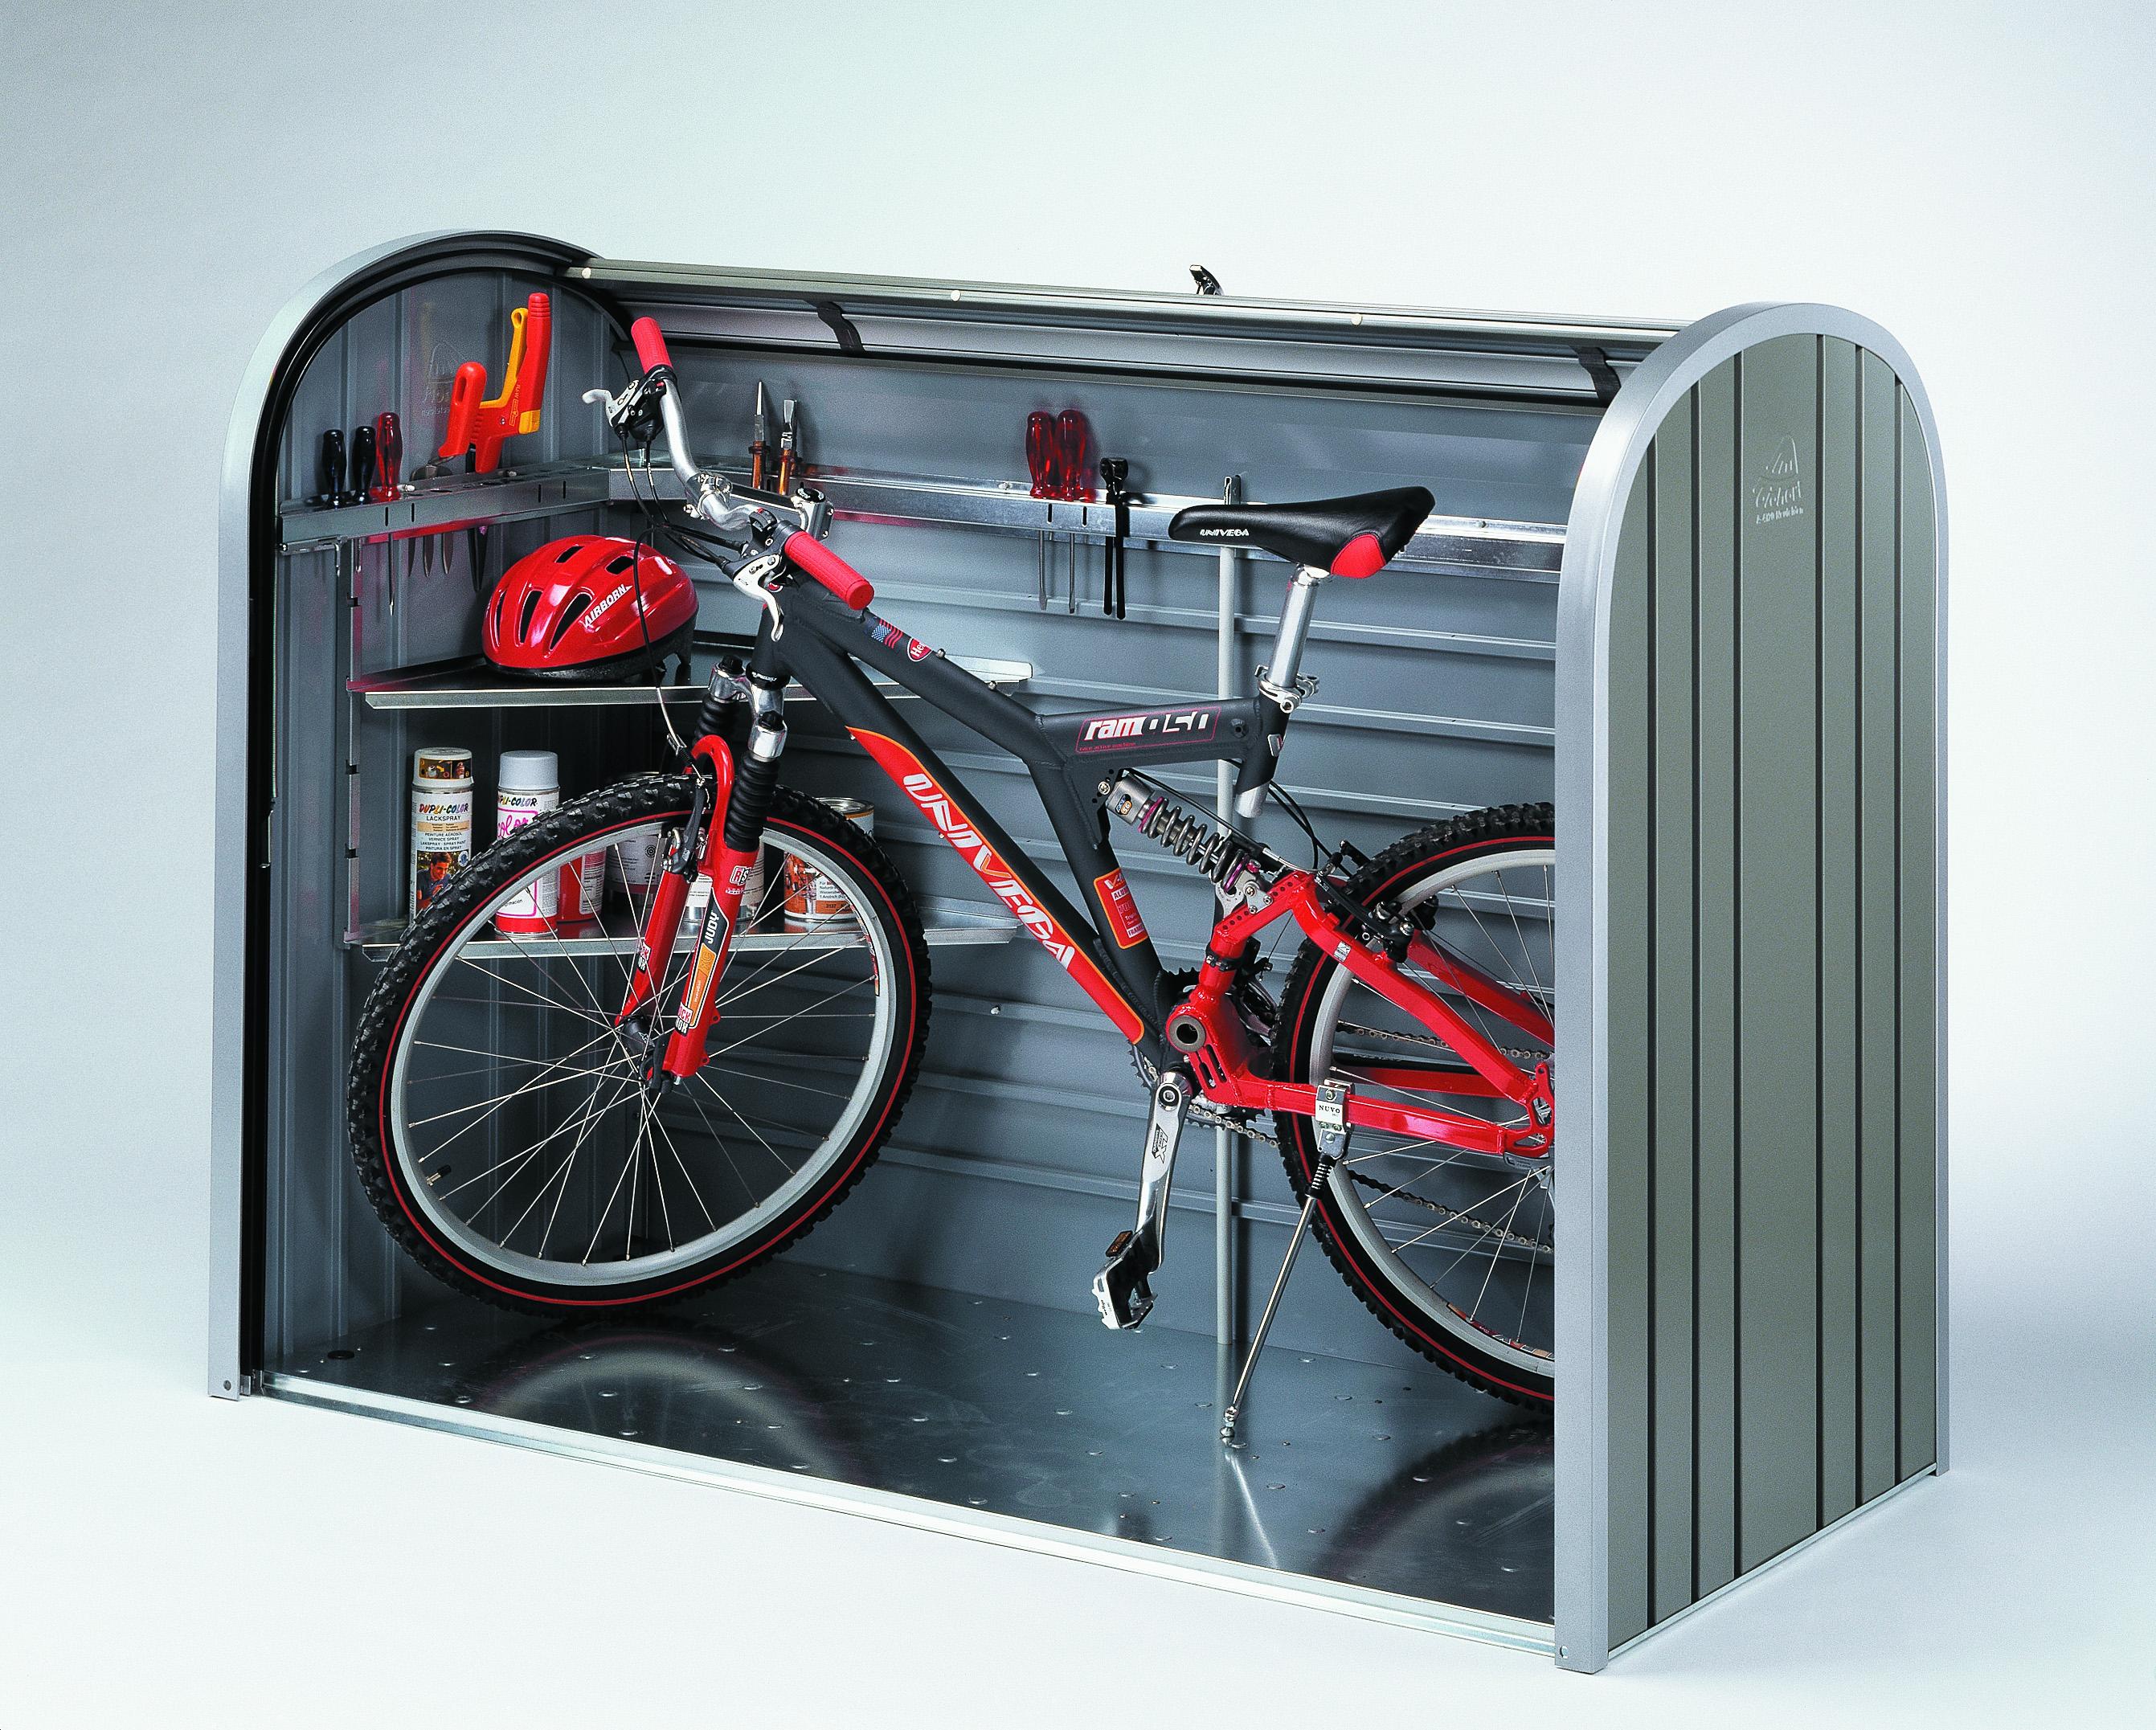 Gartenbox / Auflagenbox Biohort Storemax 160 quarzgrau Bild 2